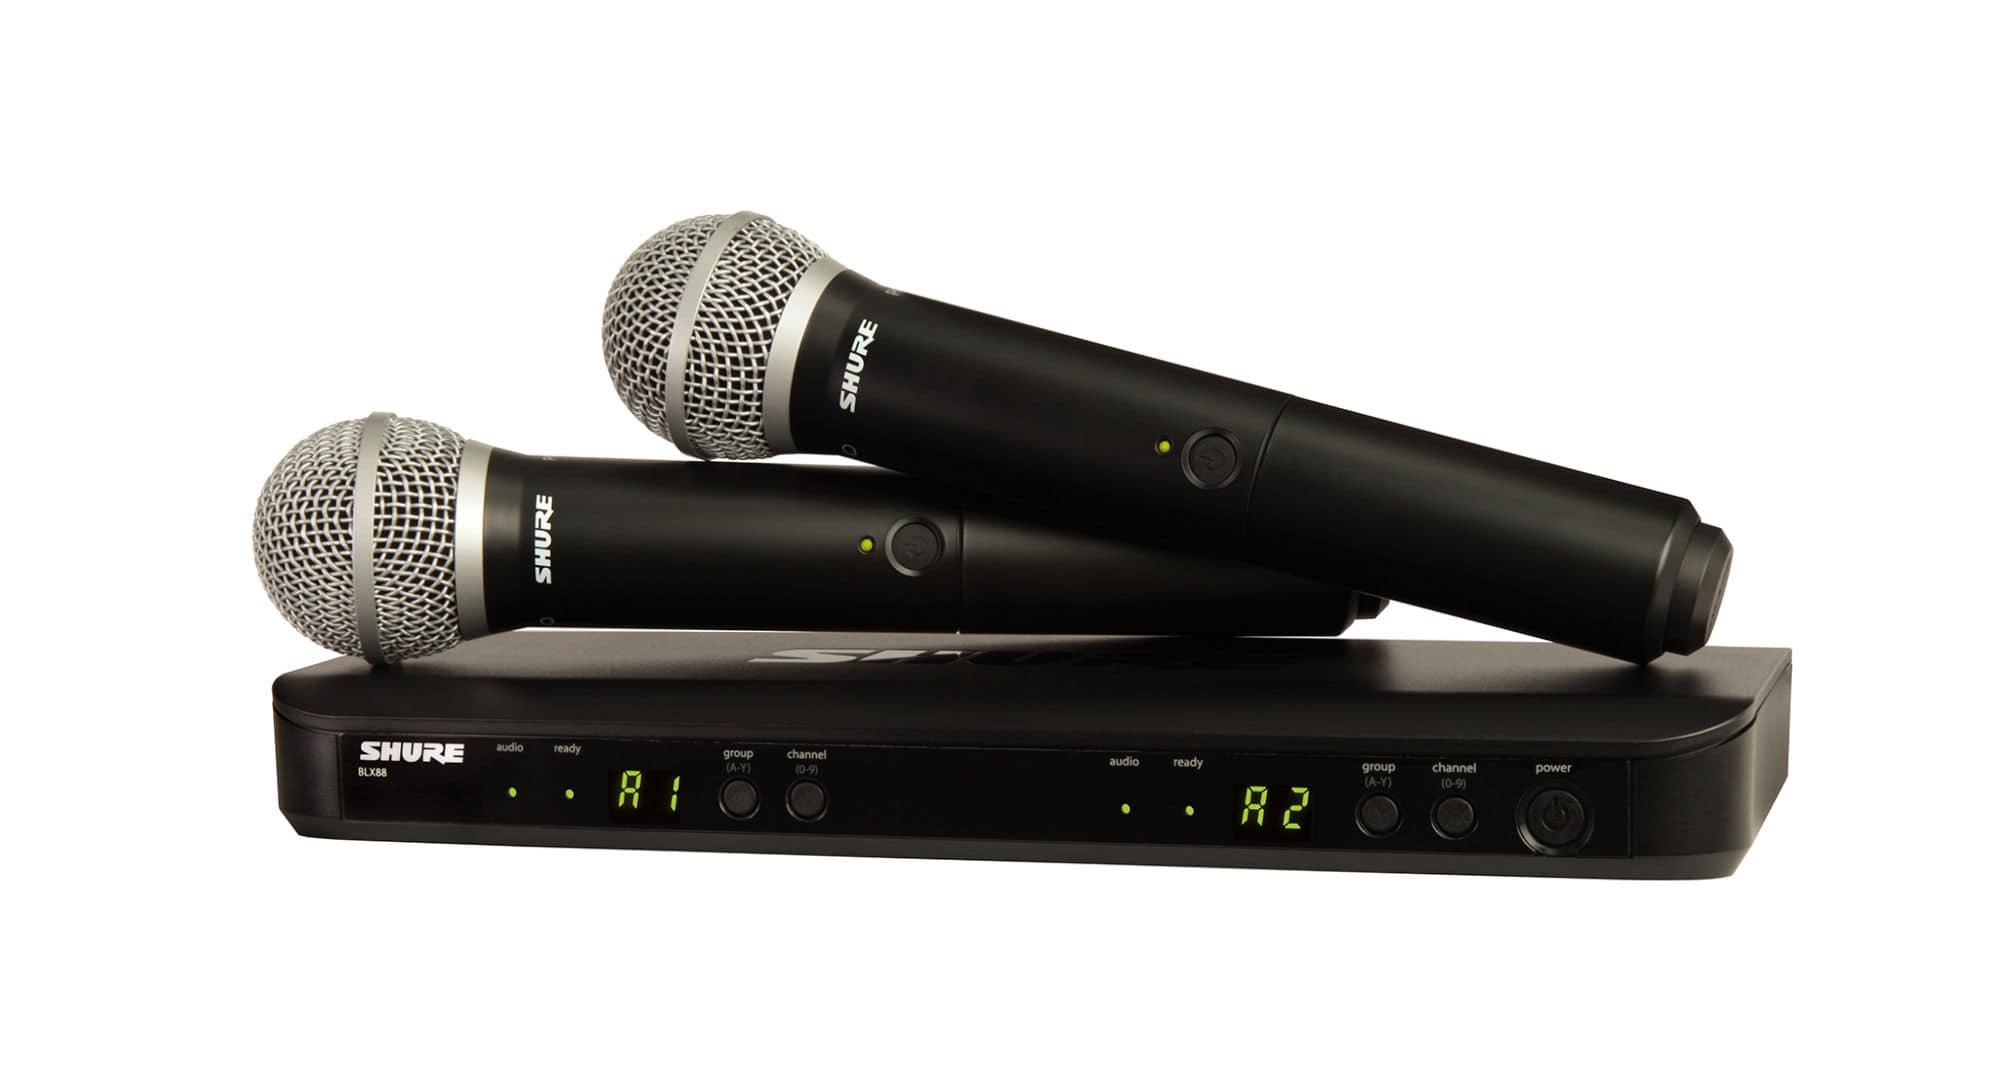 Drahtlossysteme - Shure BLX288|PG58 S8 Dual Vocal Funksystem - Onlineshop Musikhaus Kirstein